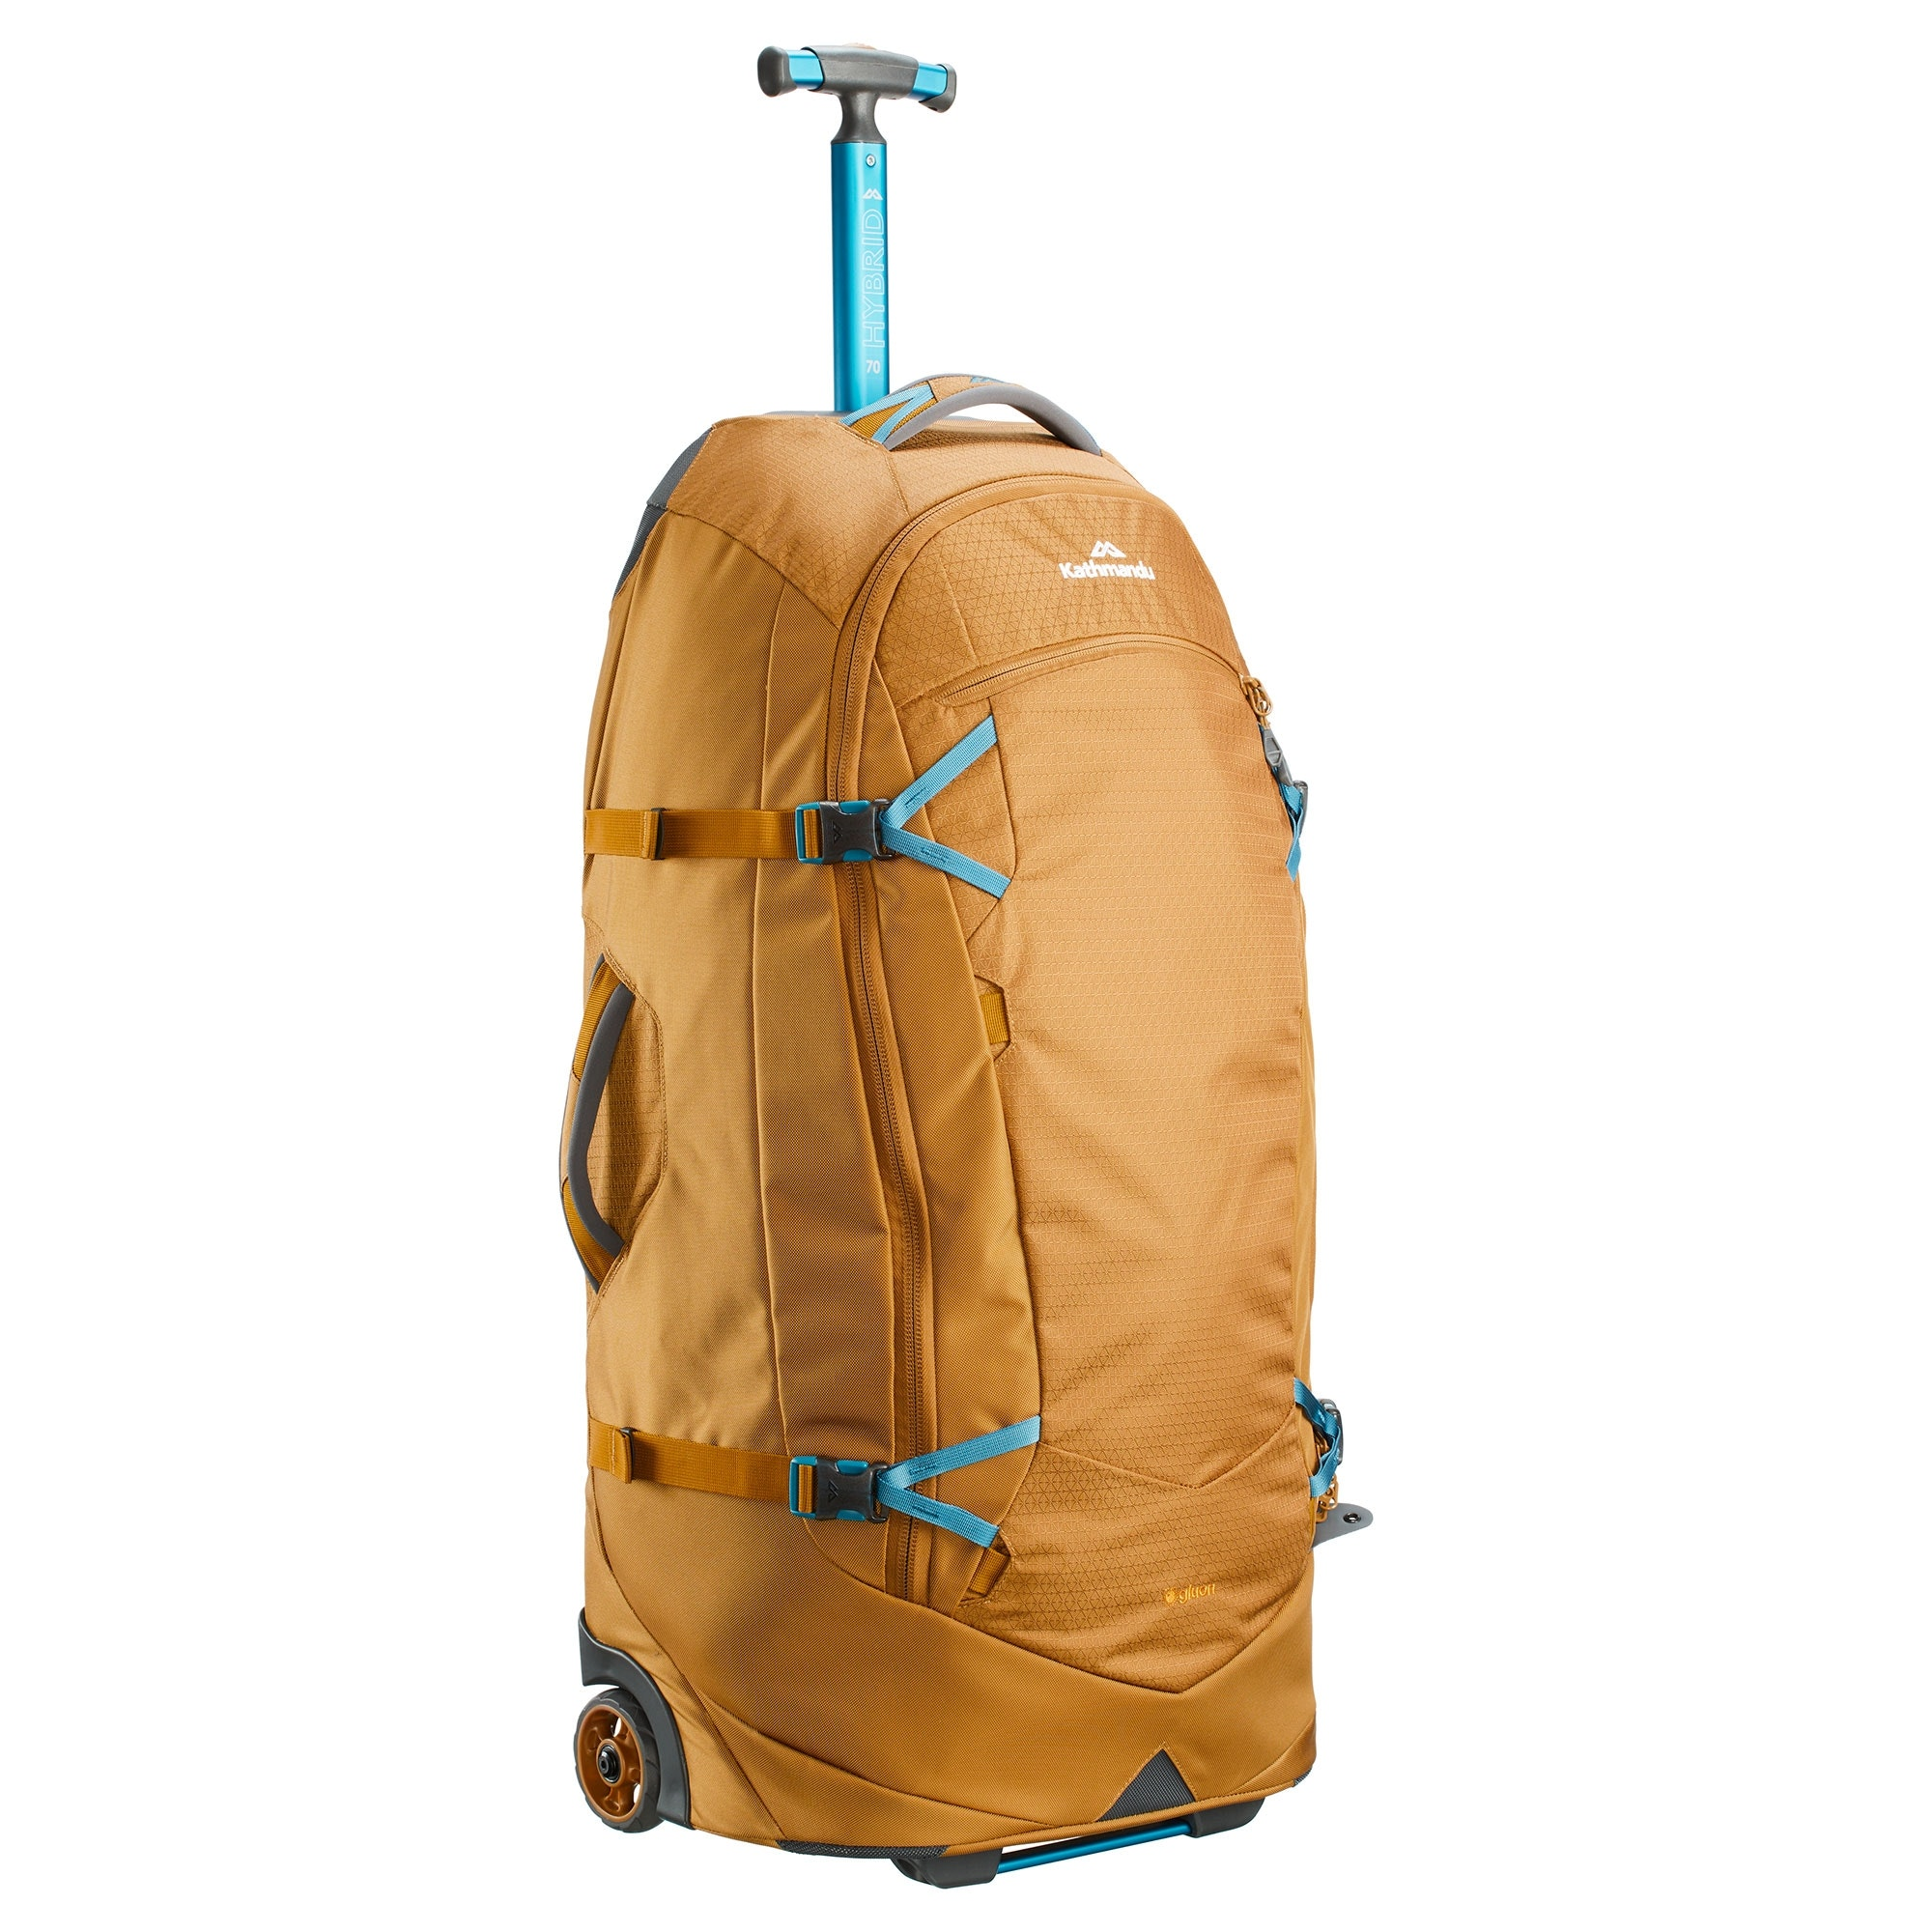 thumbnail 17 - NEW-Kathmandu-Hybrid-70L-Backpack-Wheeled-Handle-Luggage-Bag-Travel-Trolley